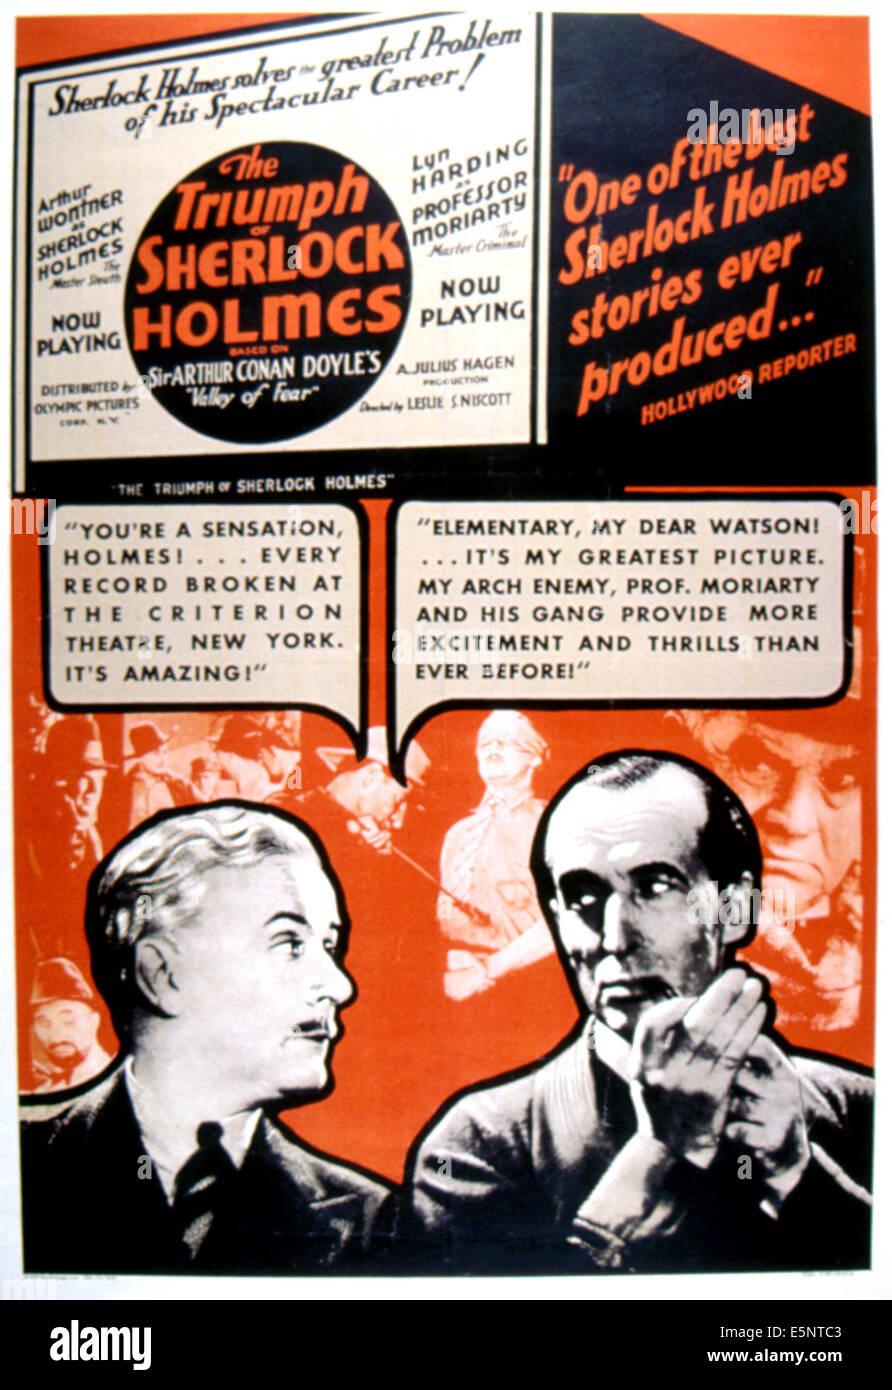 THE TRIUMPH OF SHERLOCK HOLMES, Ian Fleming, Arthur Wontner, 1935 - Stock Image